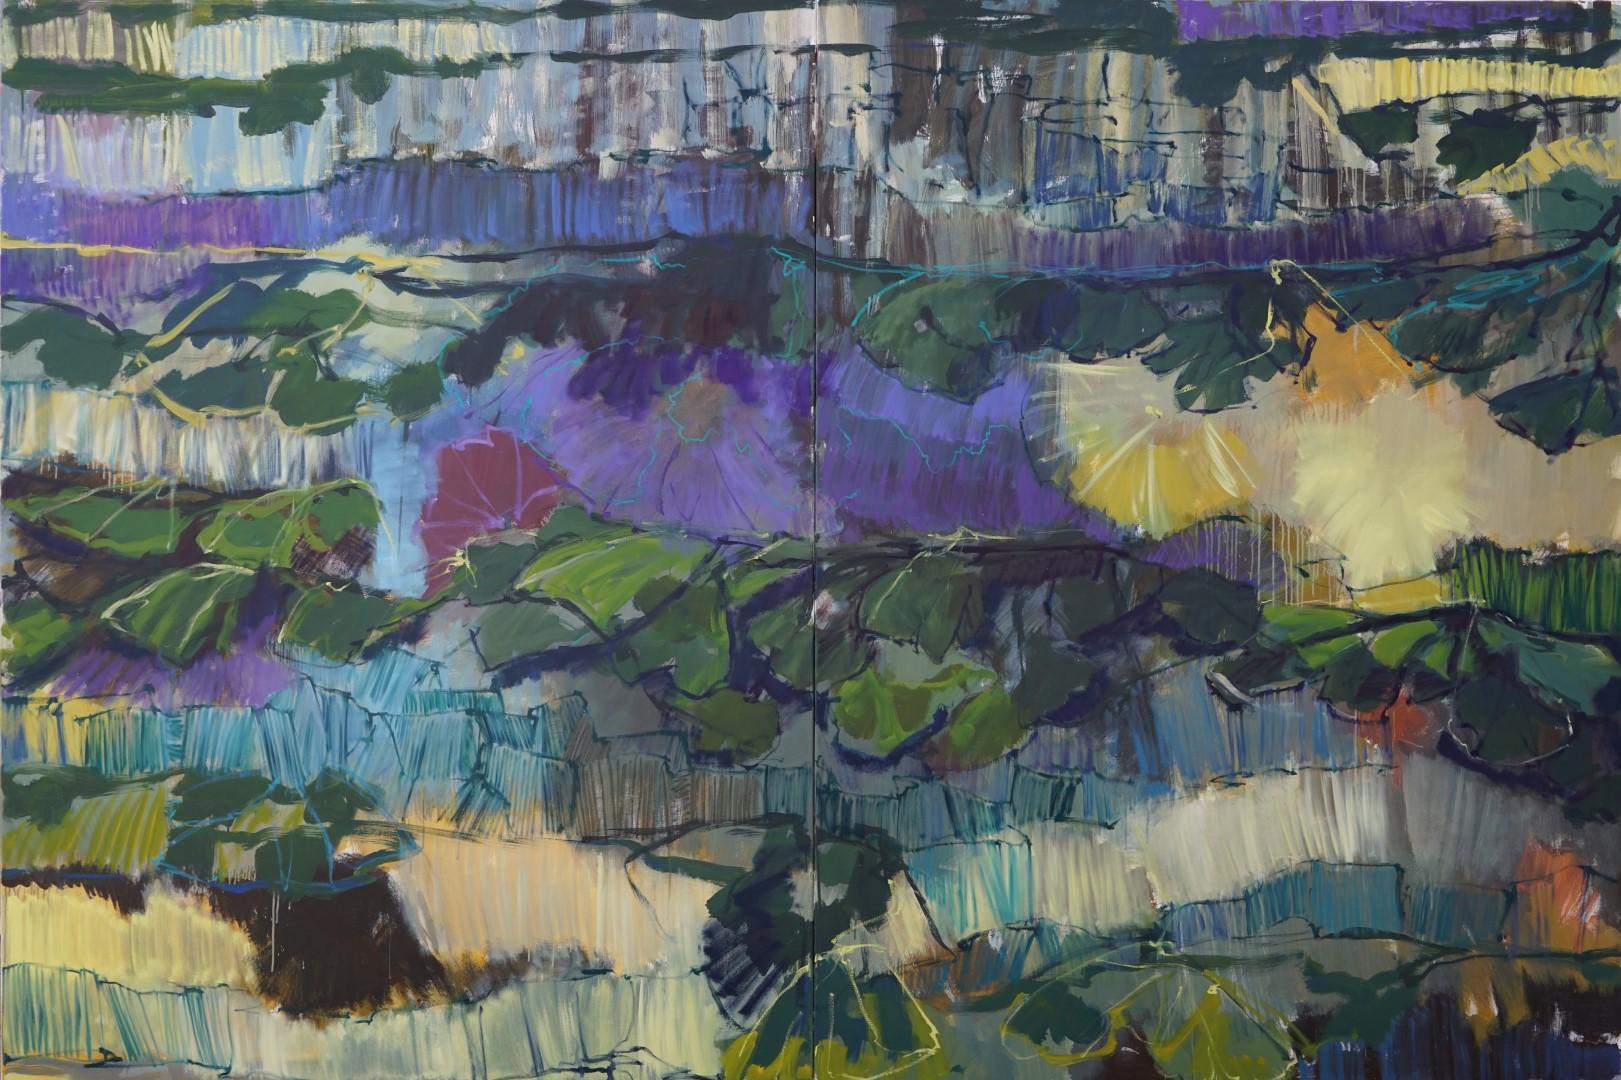 abstraktion1_2x3m